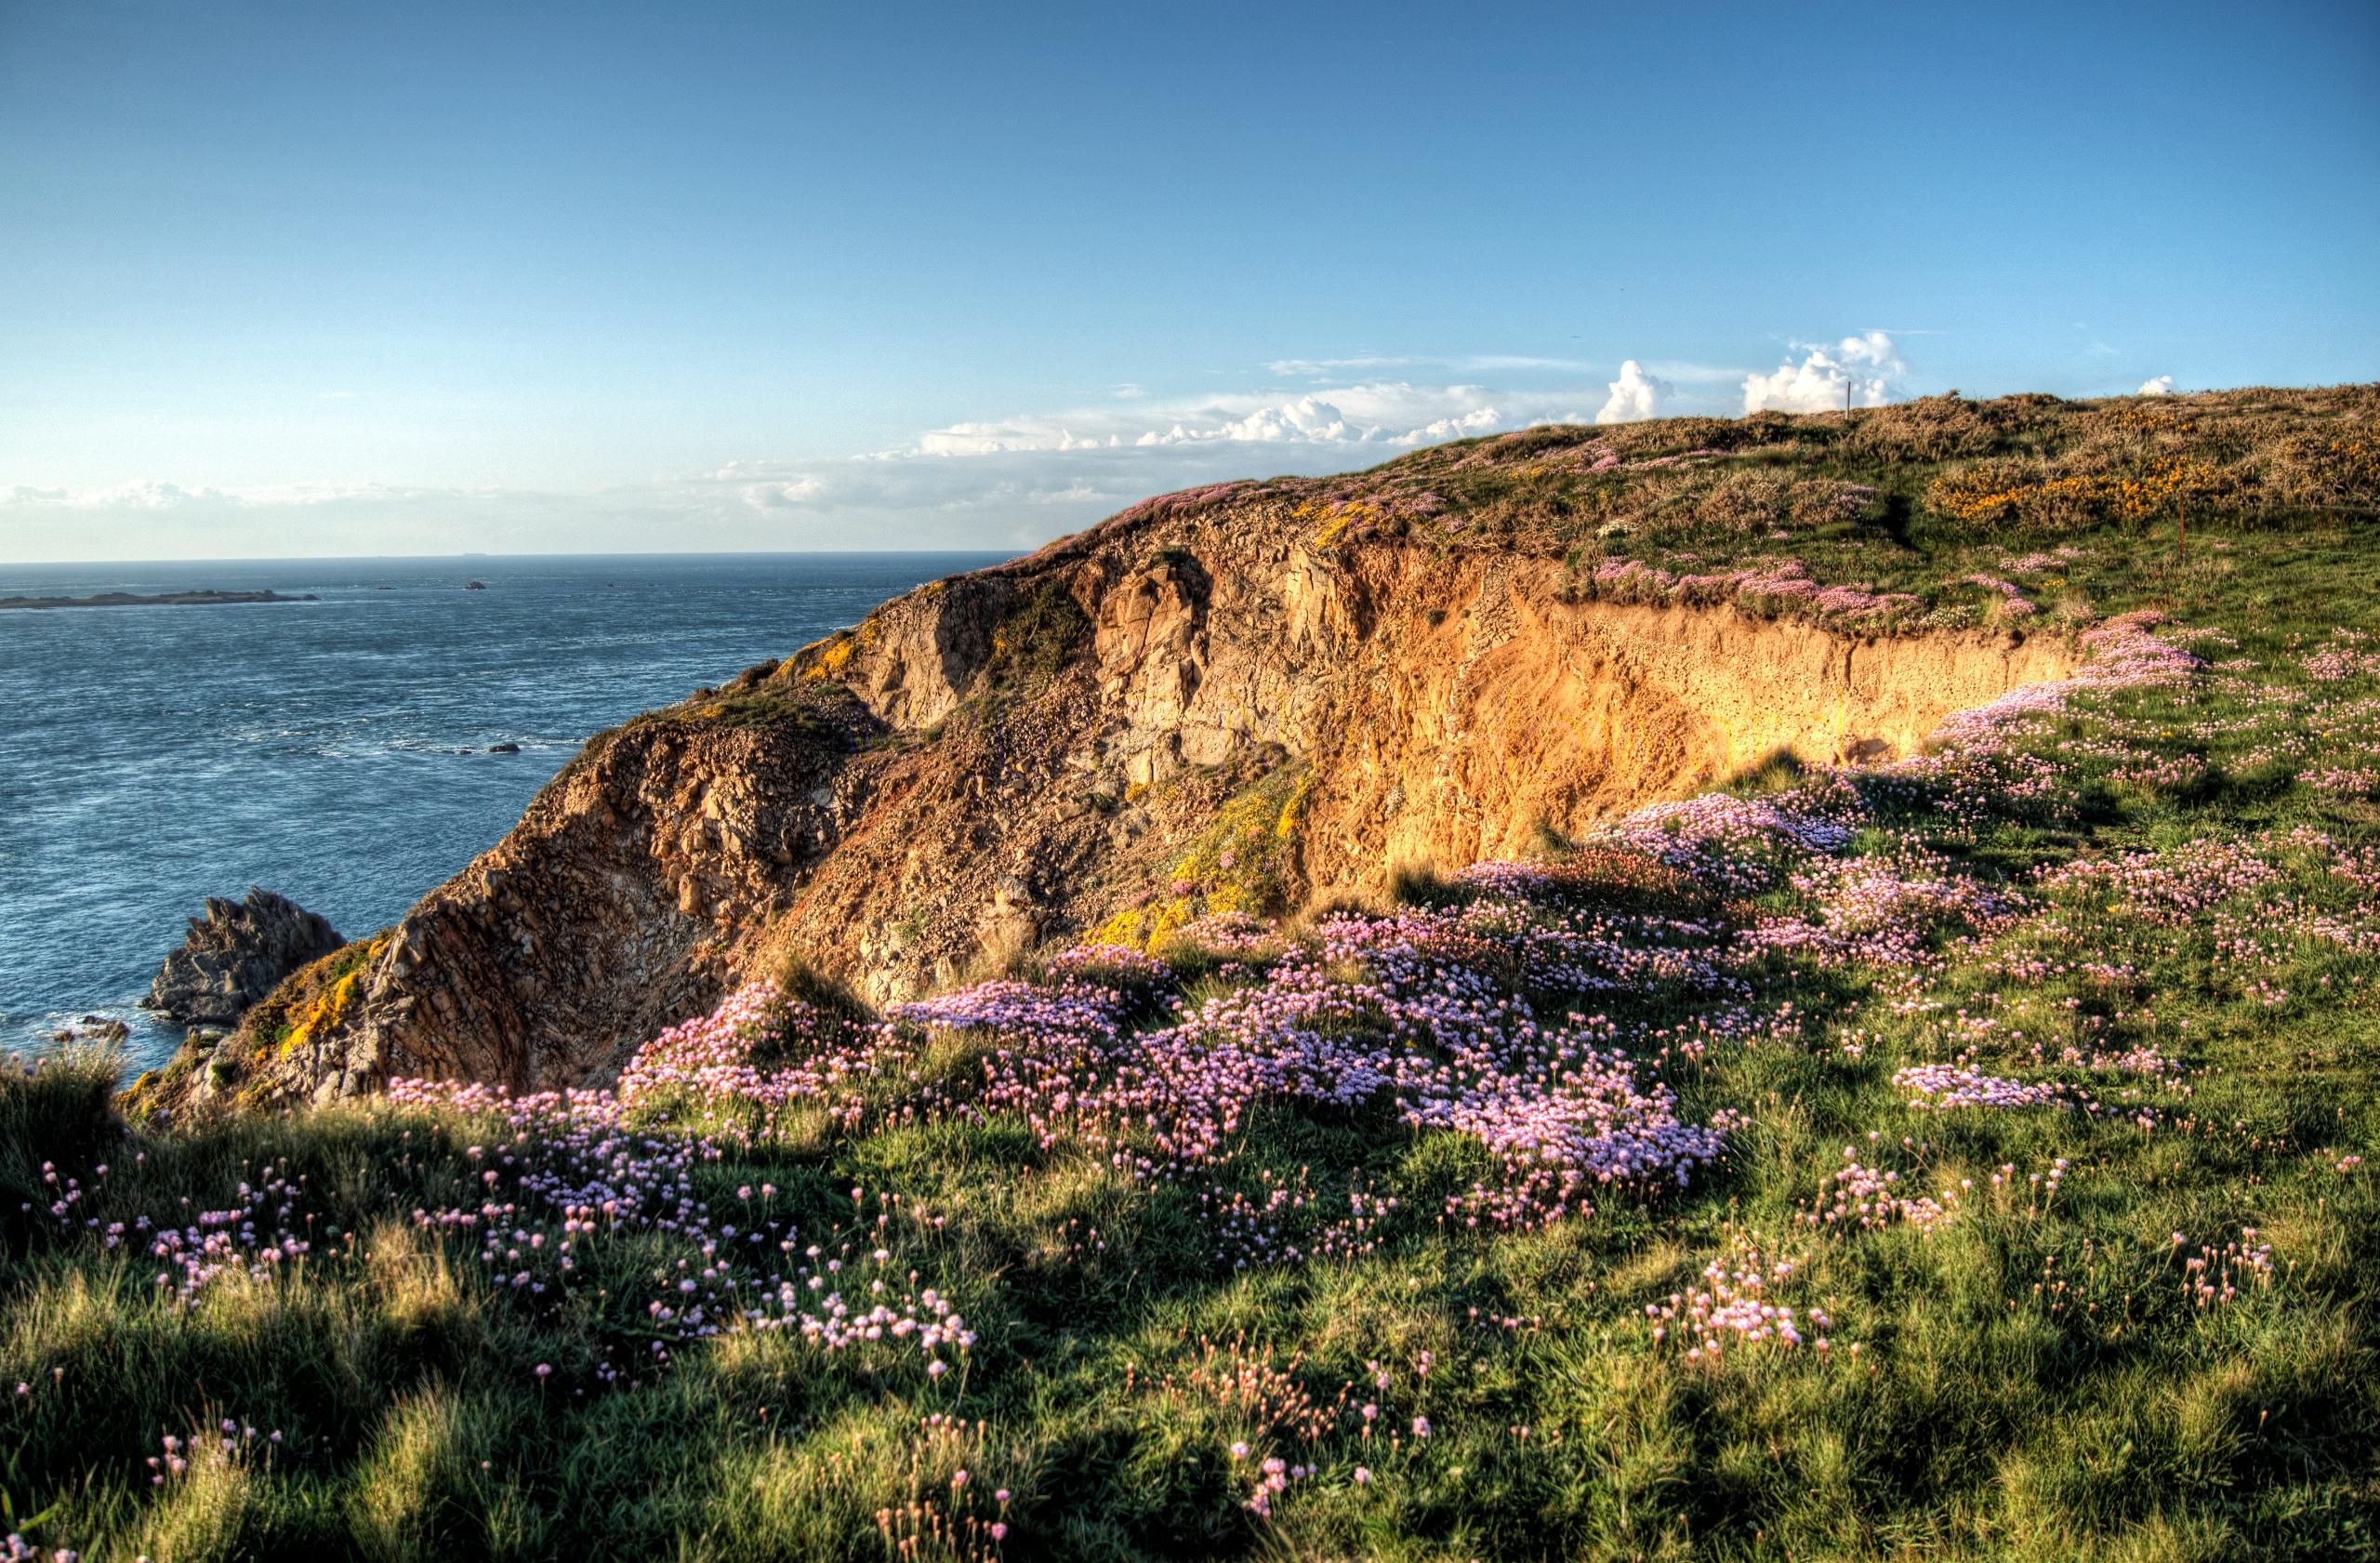 Cliff flowers - Wildflowers cli - neilhoward | ello